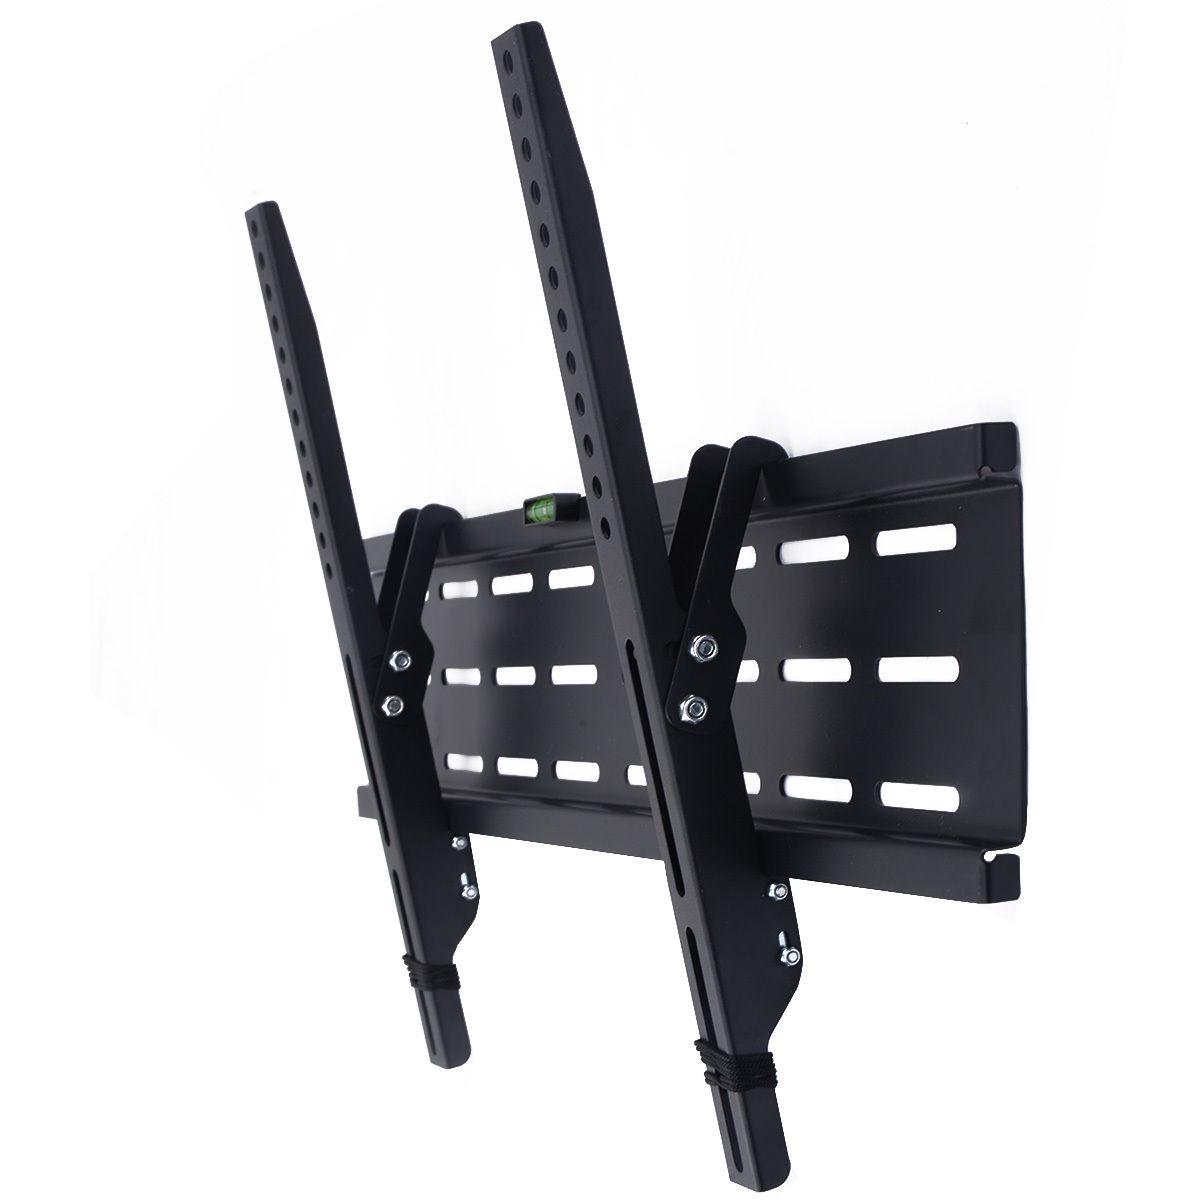 "Costway LCD LED Plasma Flat Tilt TV Wall Mount Bracket 37"" - ""70 for $10.00 + Free Shipping"